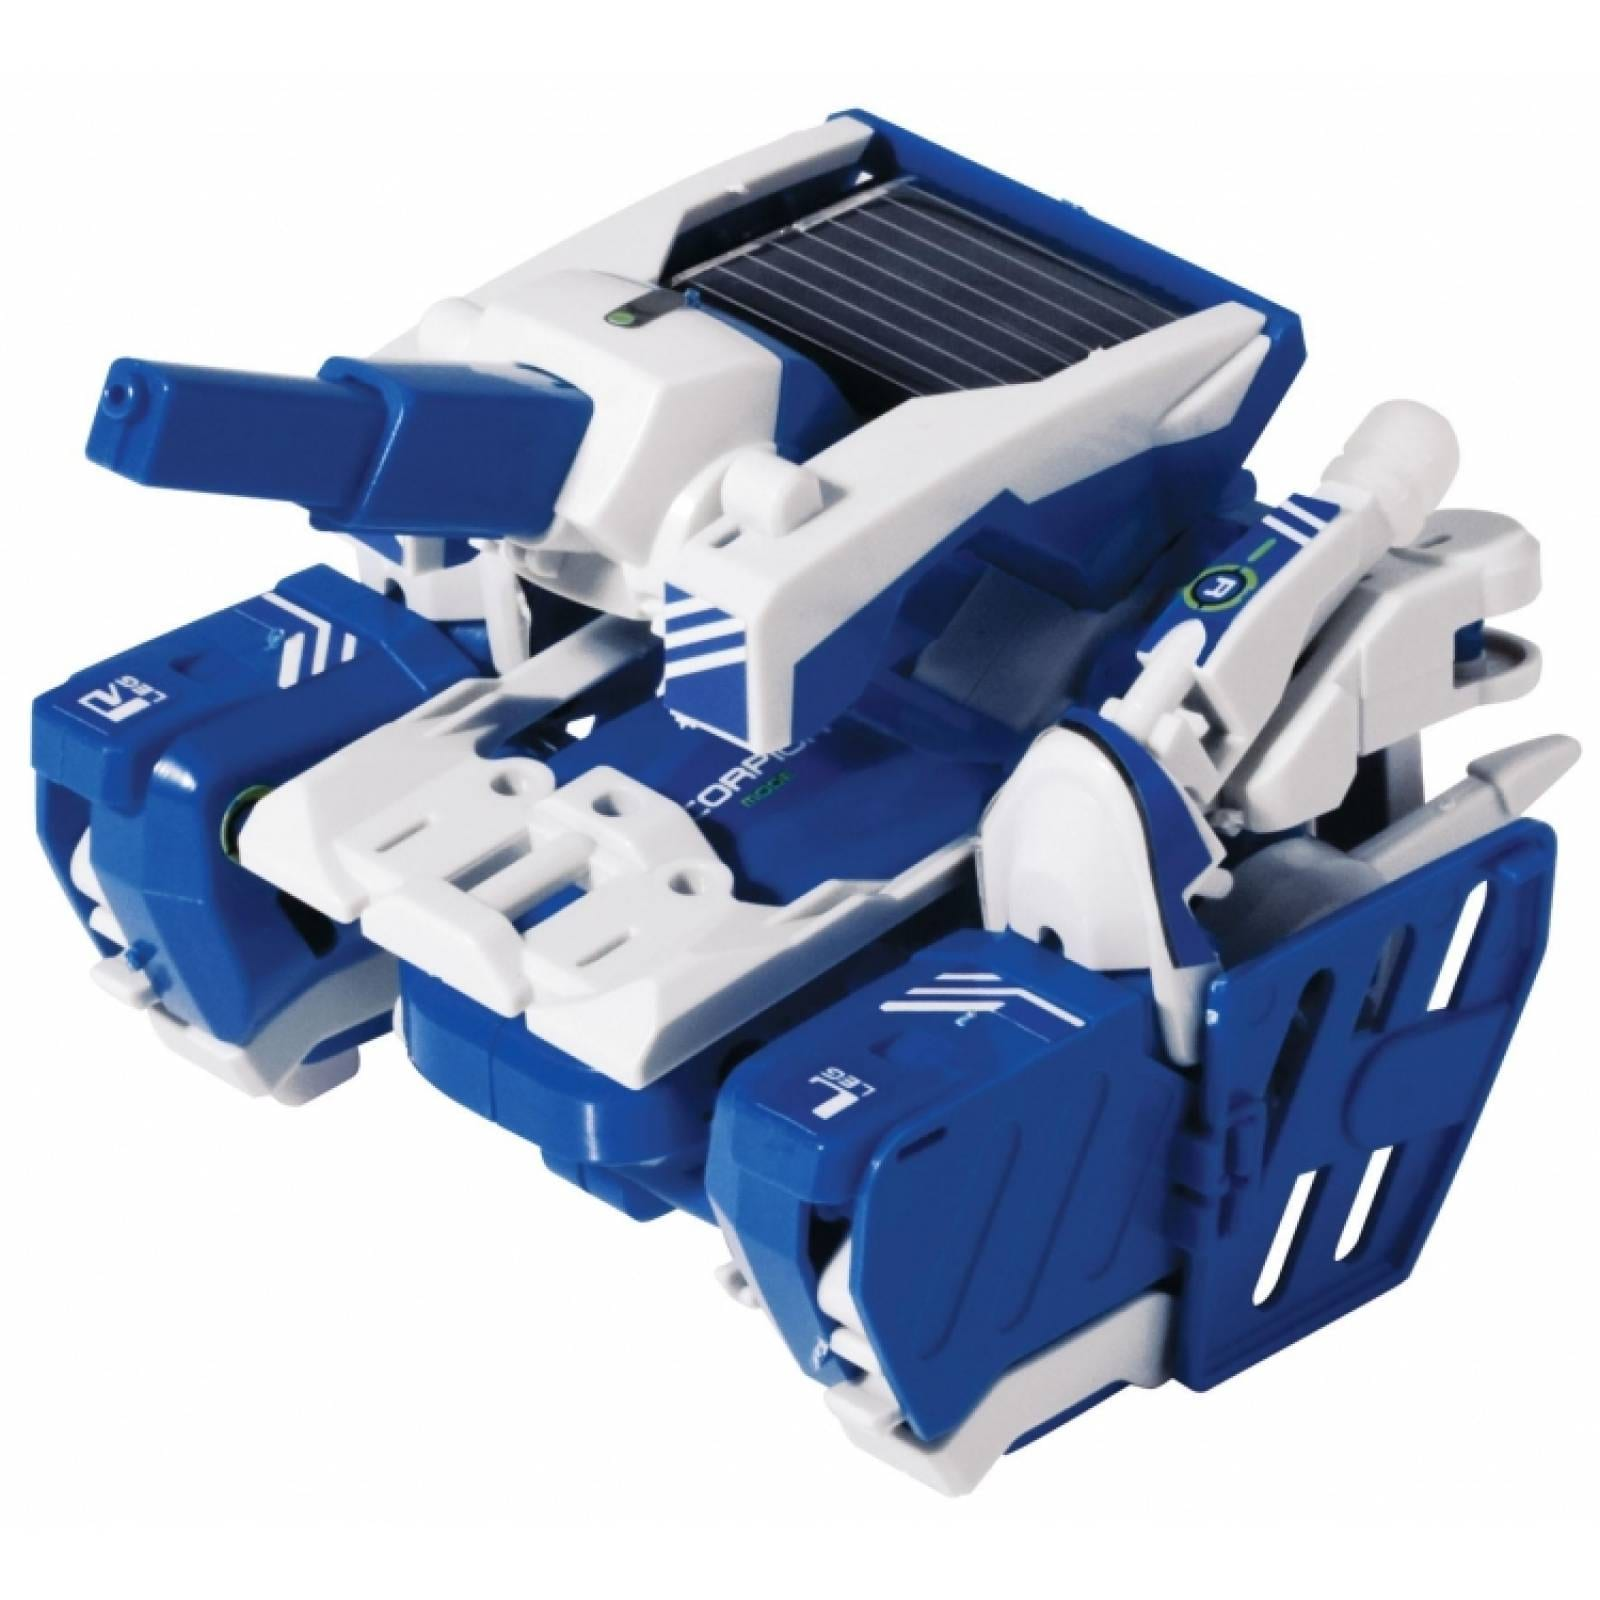 Kit solar transformer 3 en 1 para armar